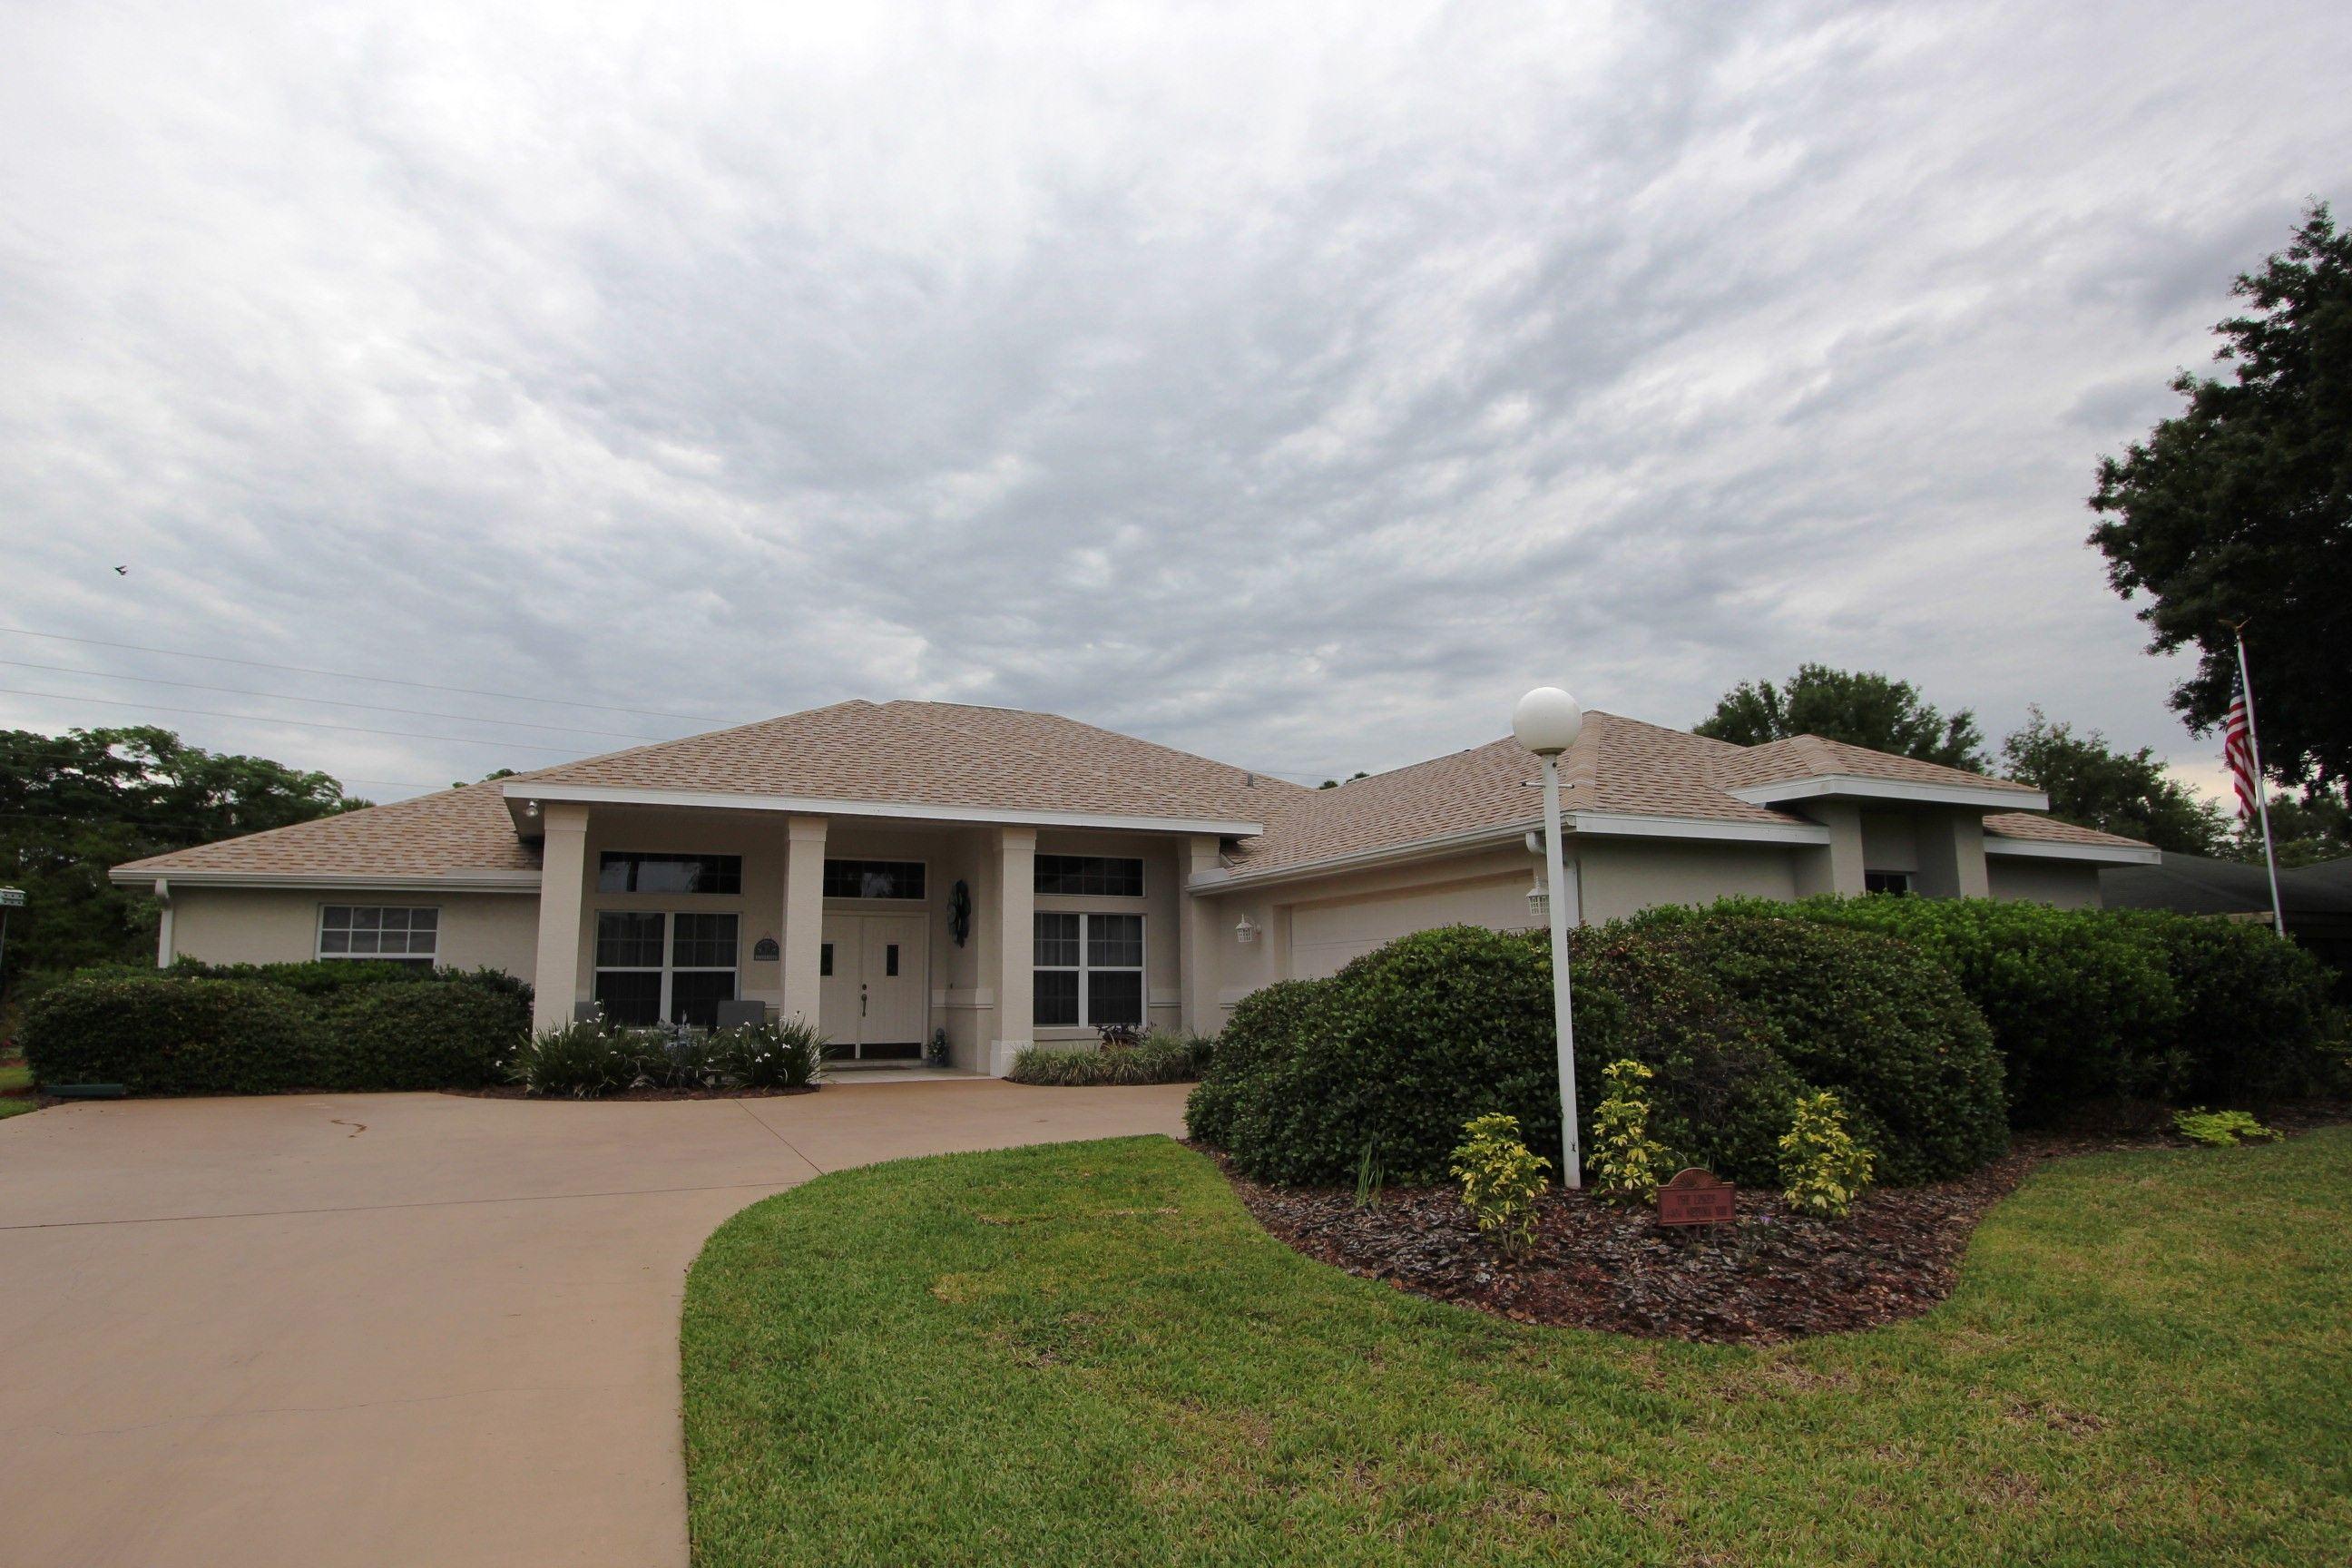 Sold Welcome To 4404 Medina Way Sebring Sensational Move In Ready Home Sebring Florida Florida Homes For Sale Florida Home